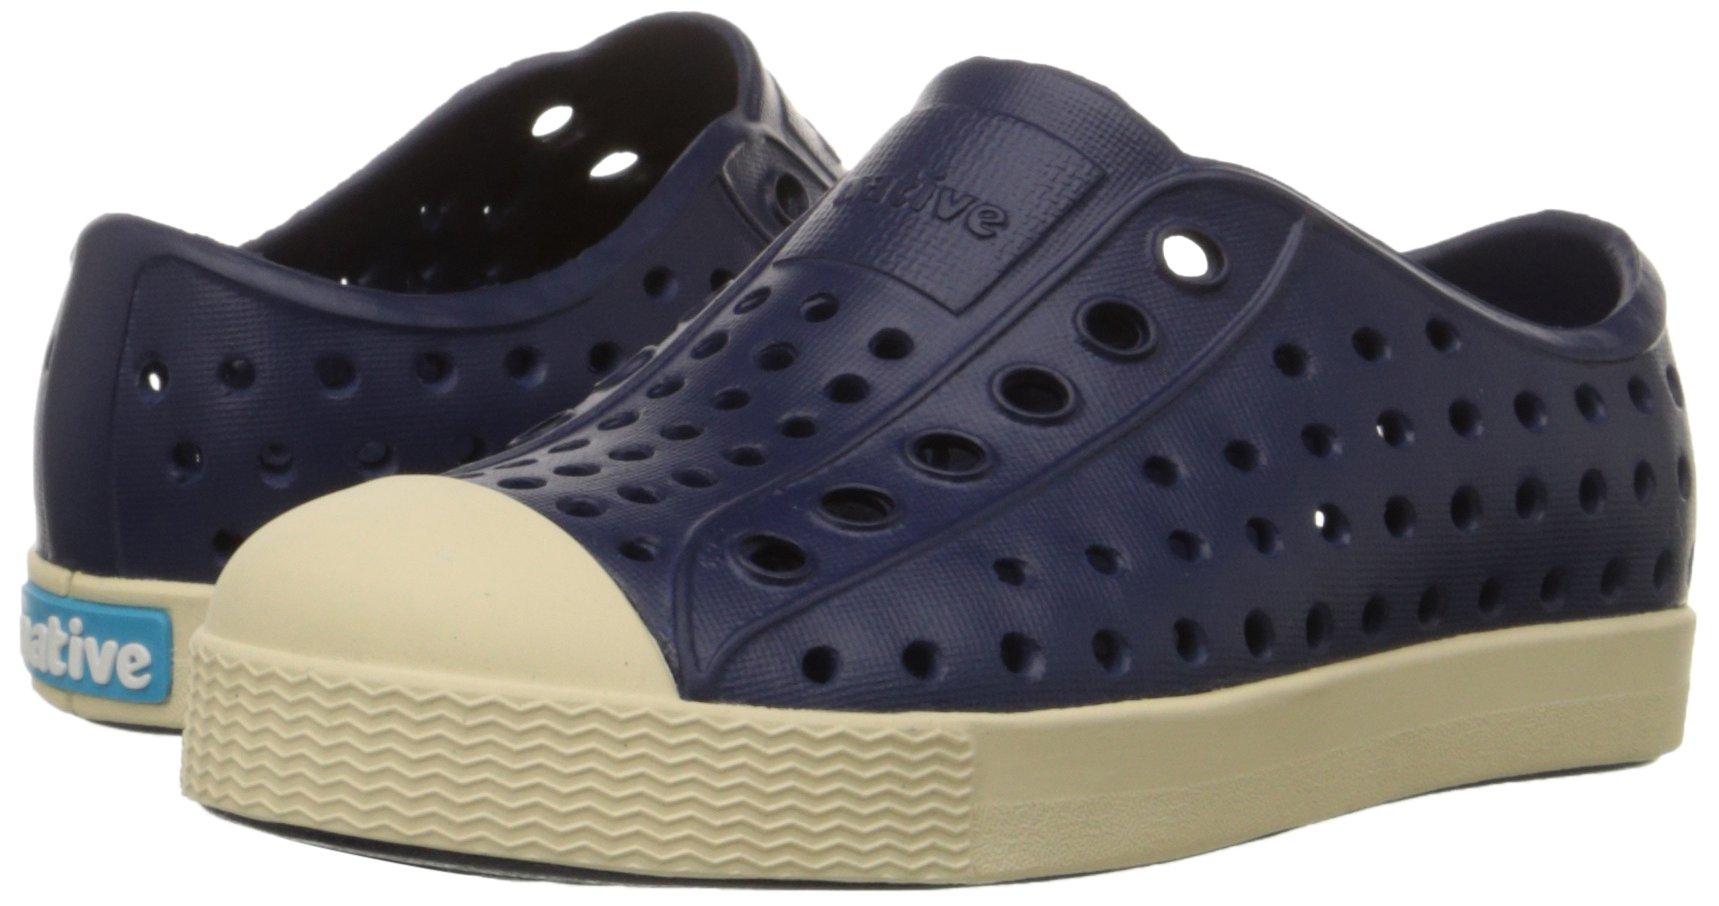 Native Jefferson Slip-On Sneaker,Regatta Blue,10 M US Toddler by Native Shoes (Image #6)